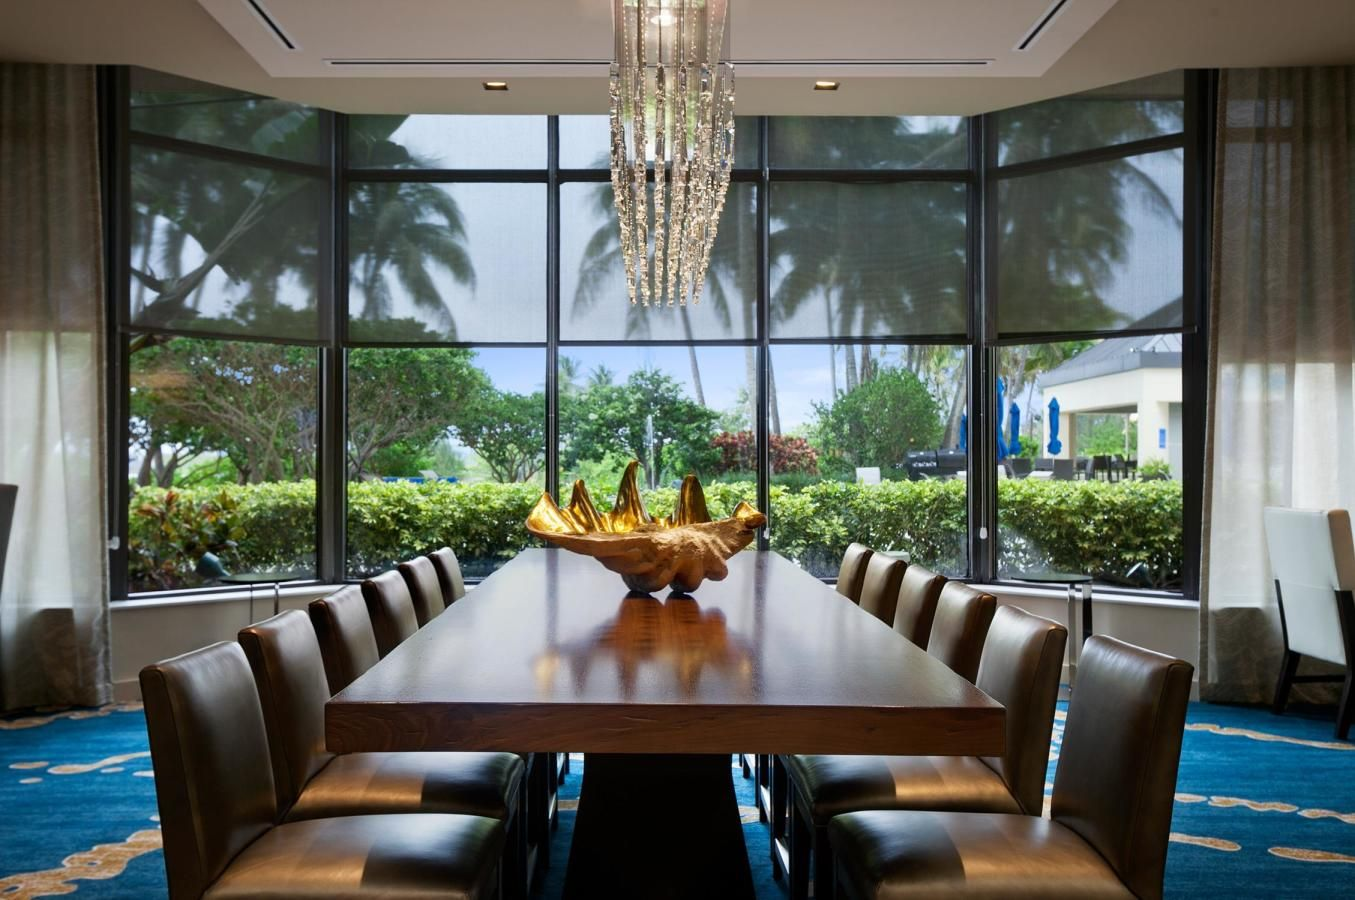 Hilton Miami Airport Blue Lagoon Meeting Space